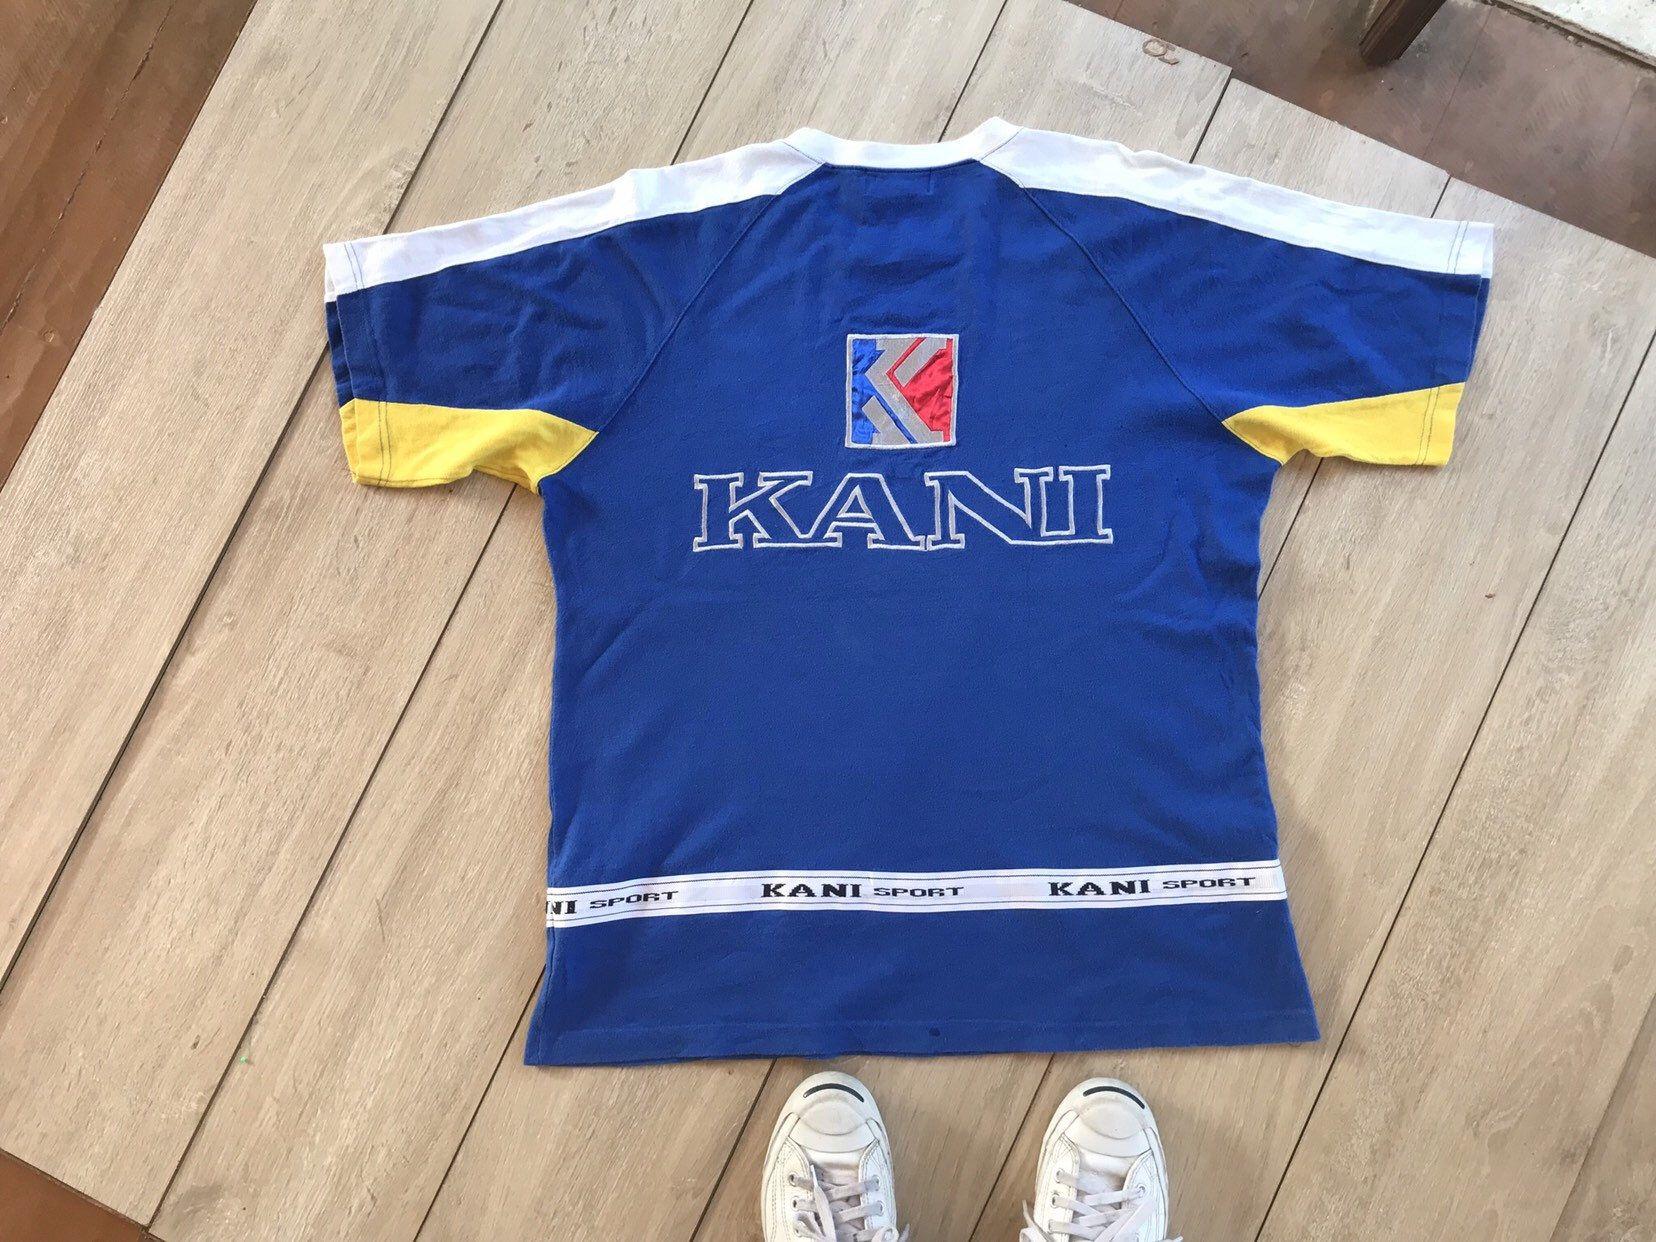 Kani Sport Sportswear Blue T Shirt Unisex Clothing Size F Unisex Clothing Shirts T Shirt